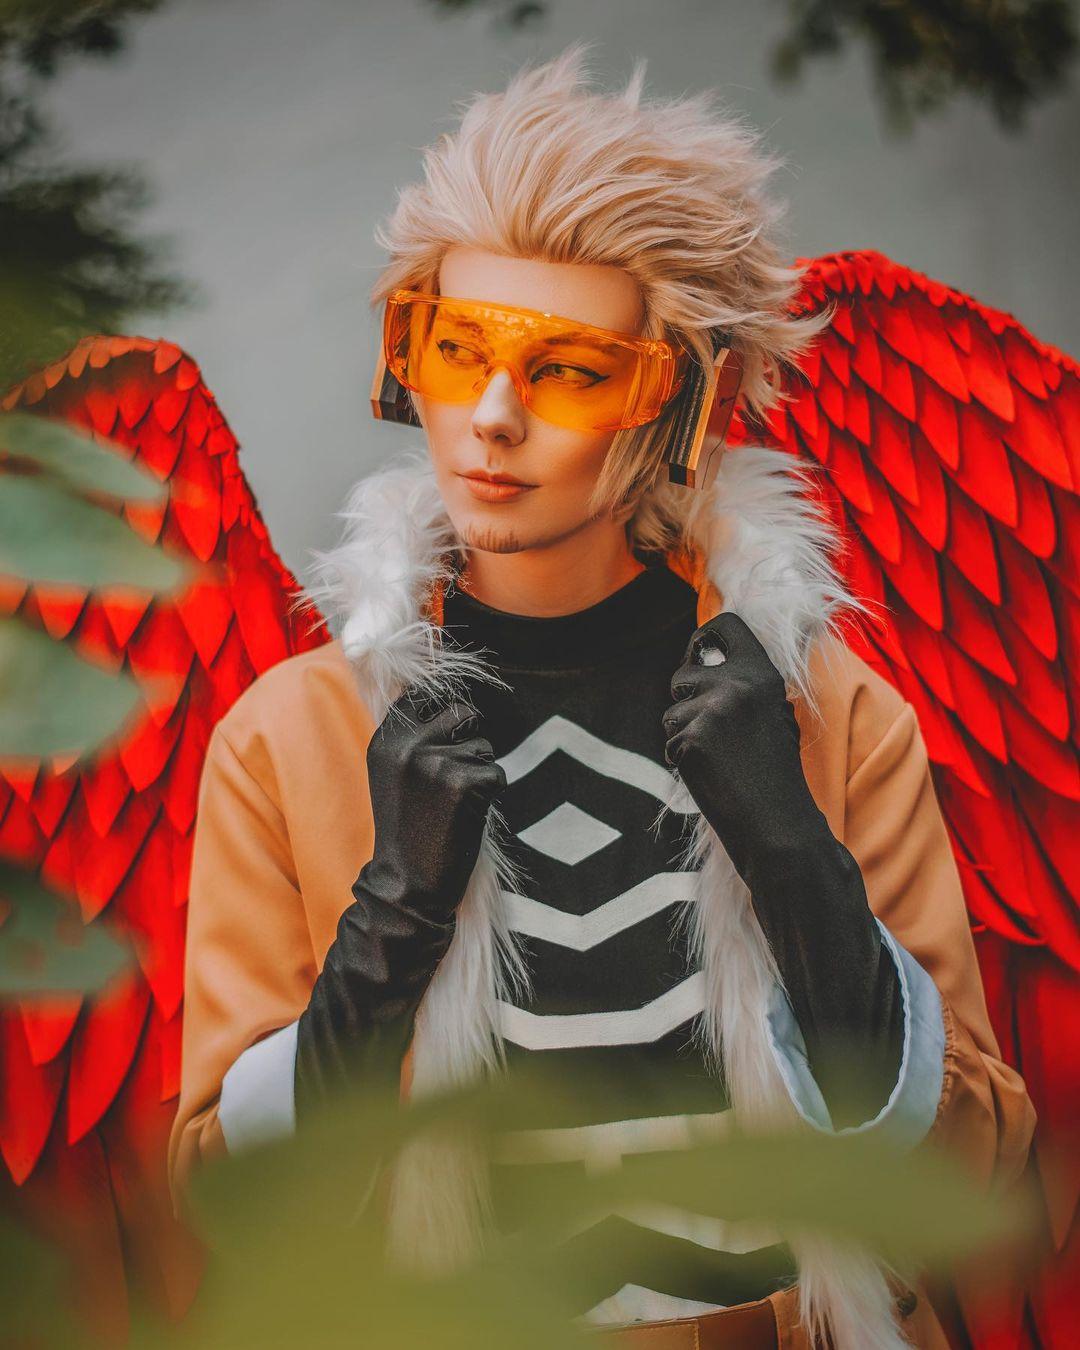 Hawks Keigo Takami my hero academia cosplay sanny cosplayer